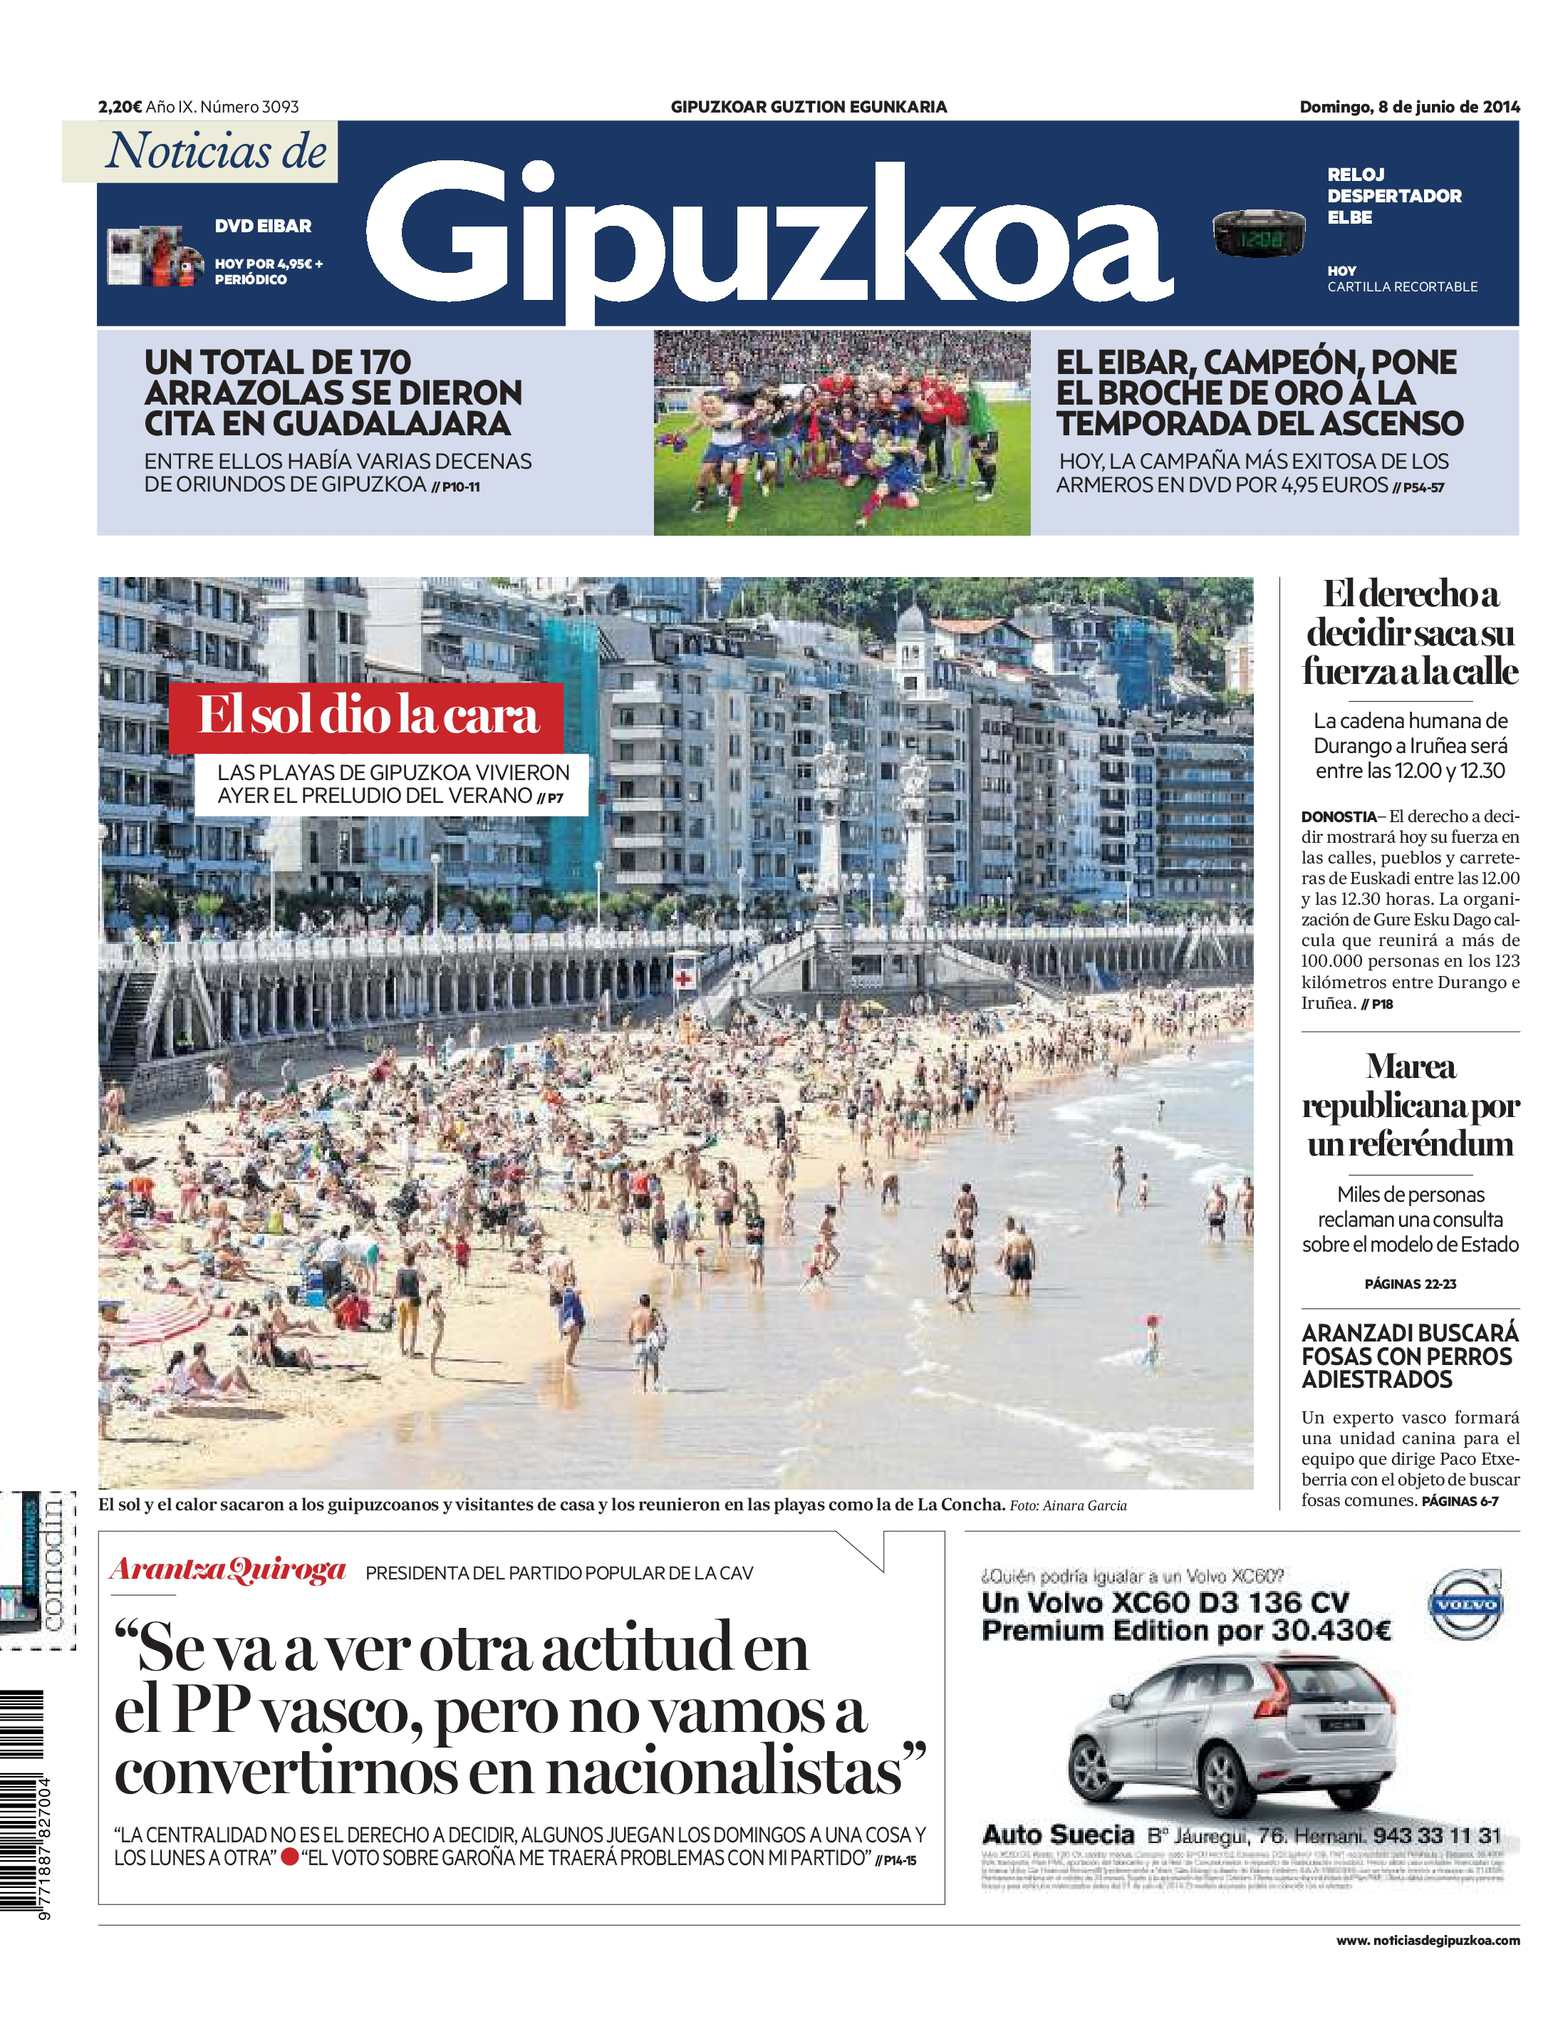 8 Apellidos Vascos Porno calaméo - noticias de gipuzkoa 20140608